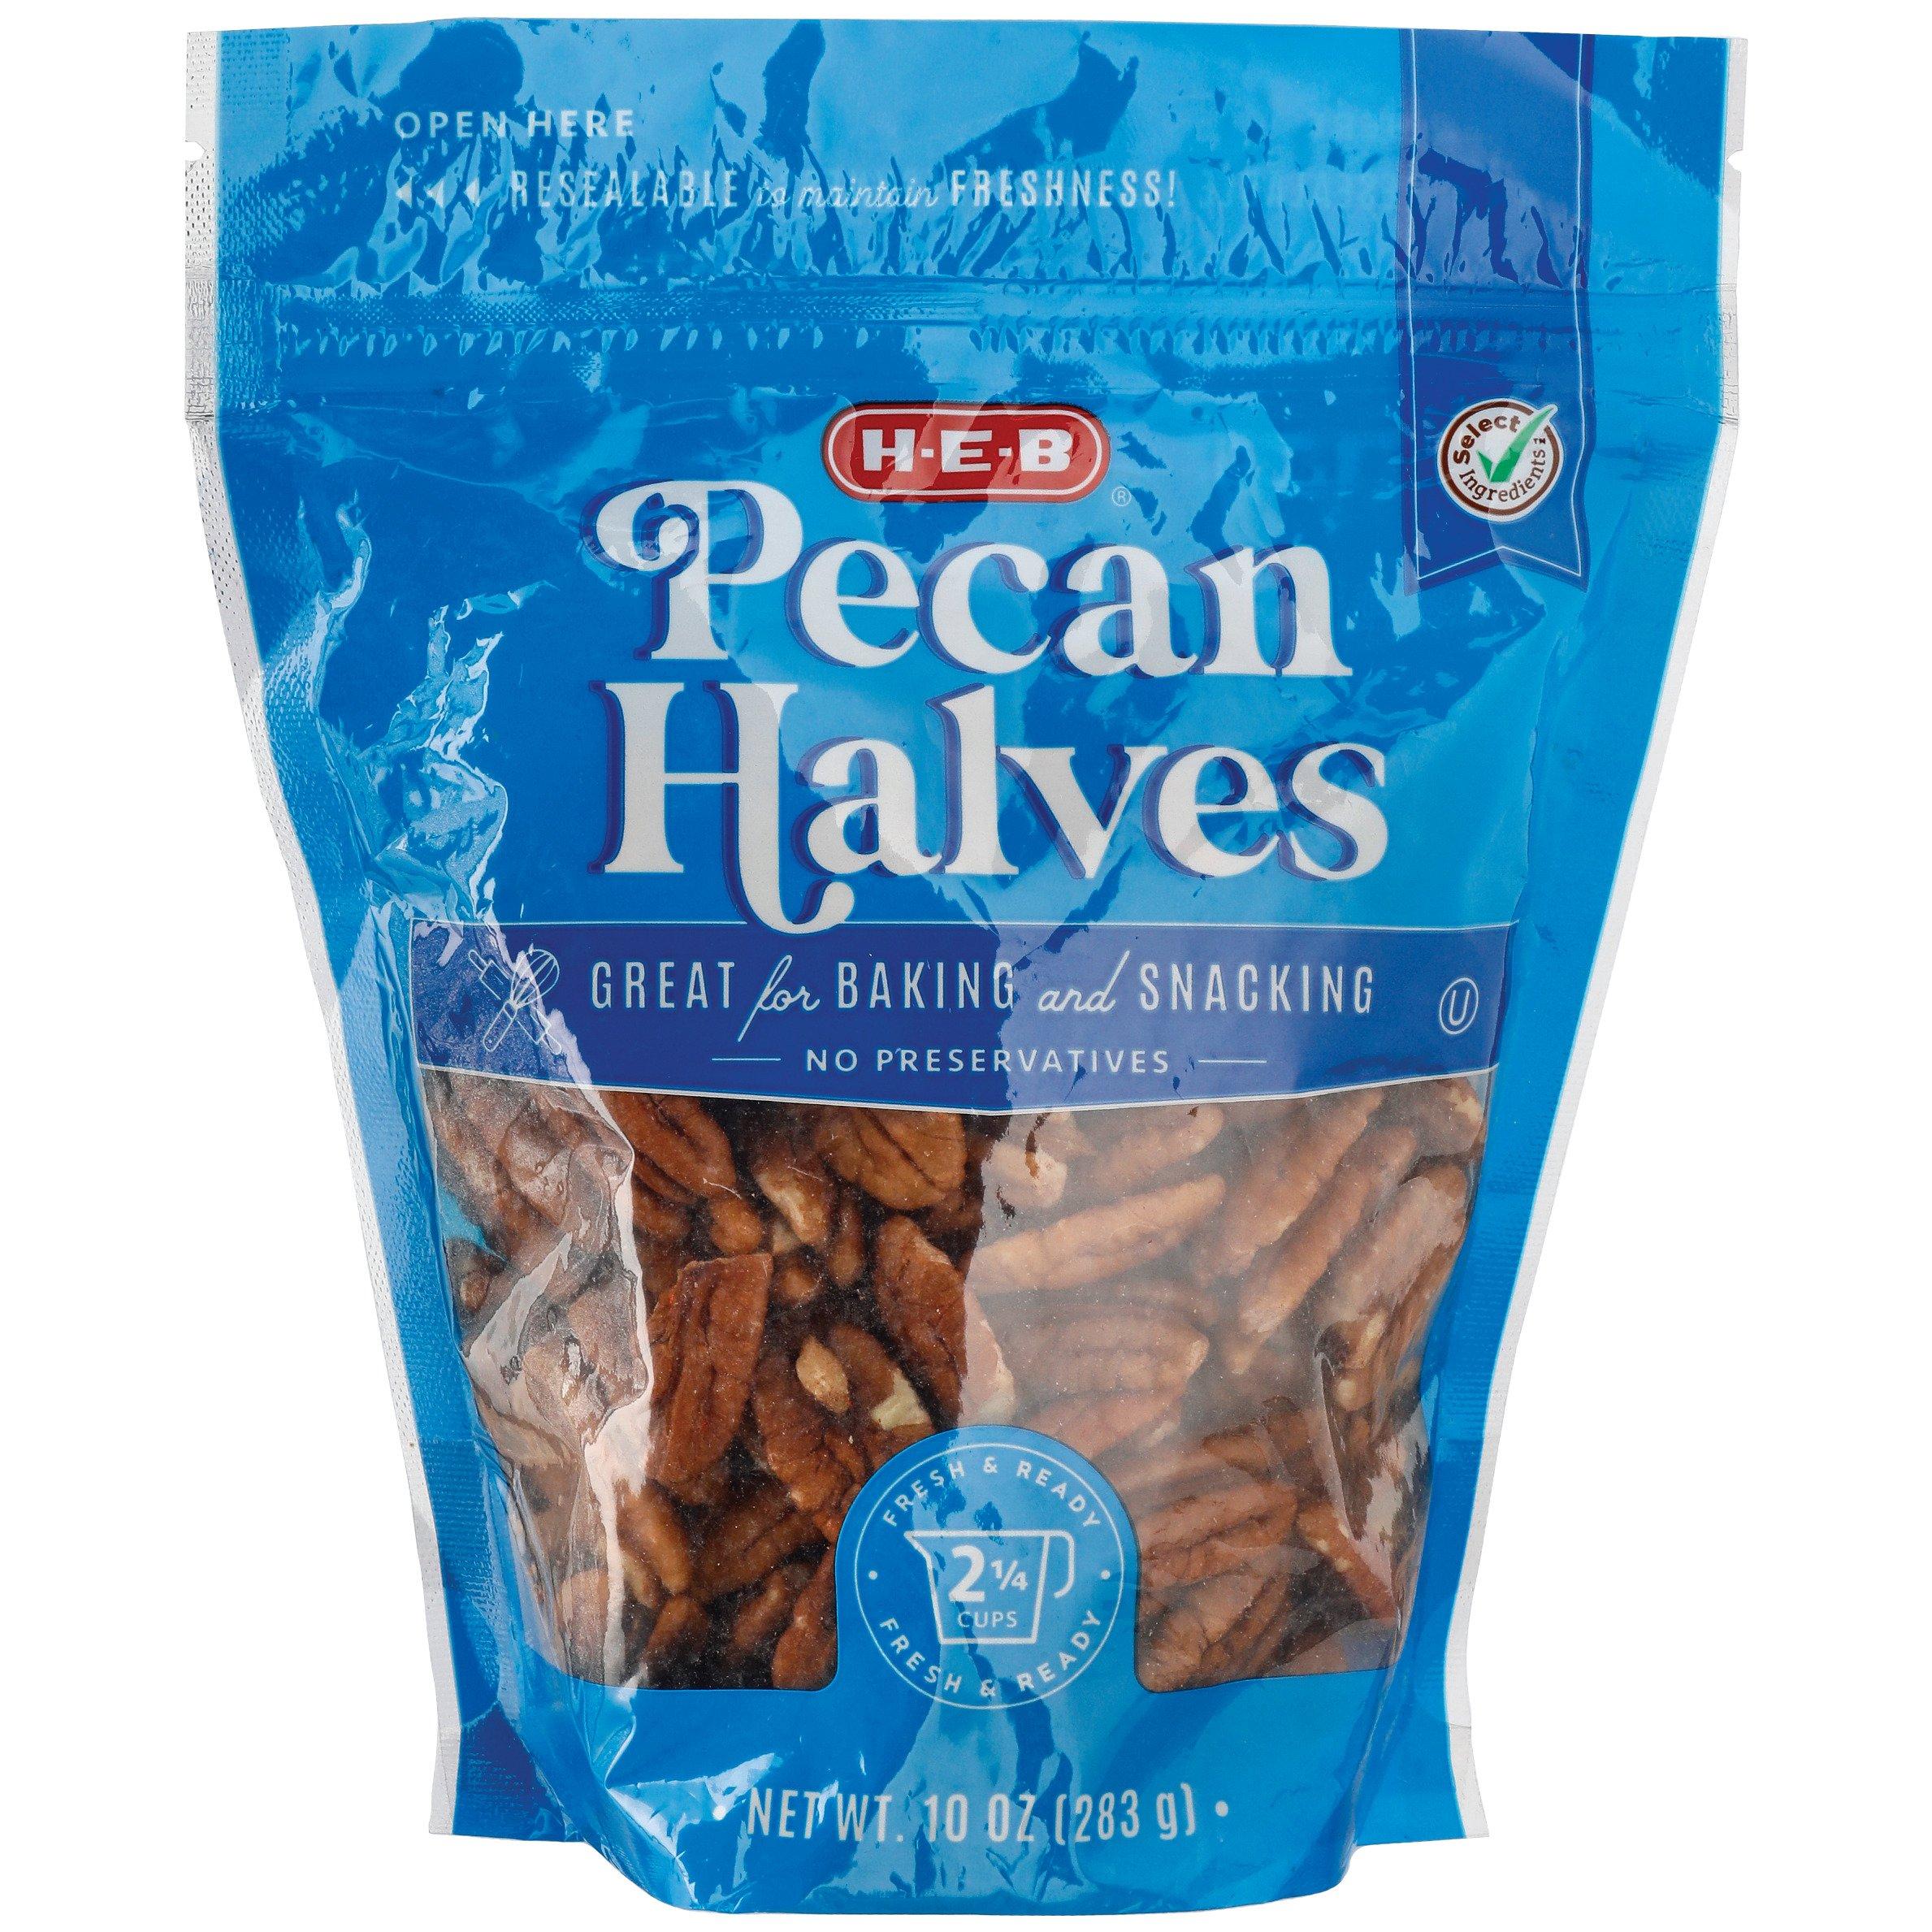 H-E-B Select Ingredients Pecan Halves